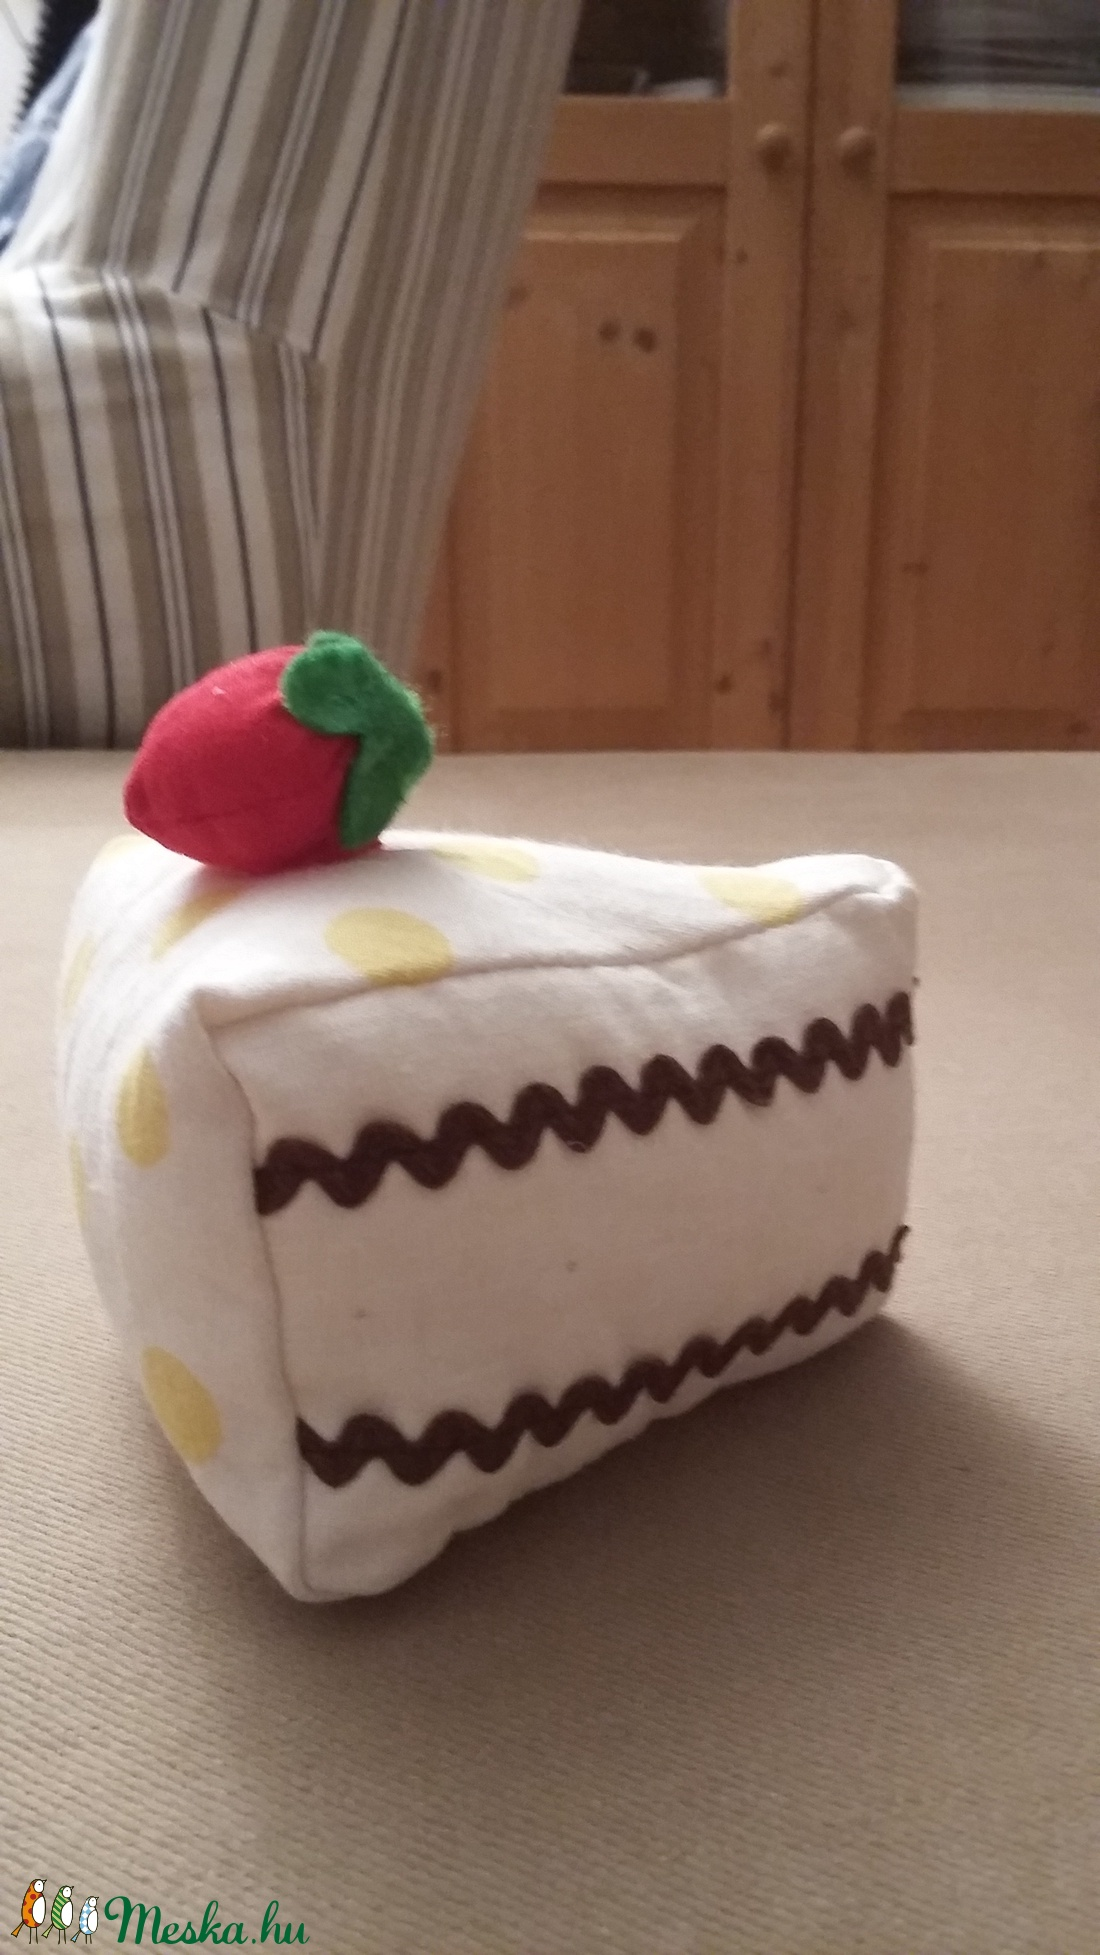 Torta csoki krémes (HollyH) - Meska.hu